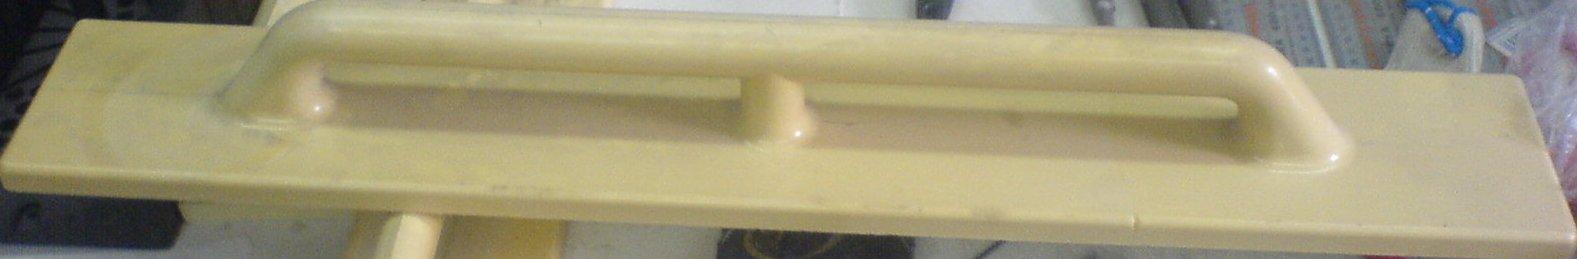 Доска тёрочная Полутерка (120х800мм)